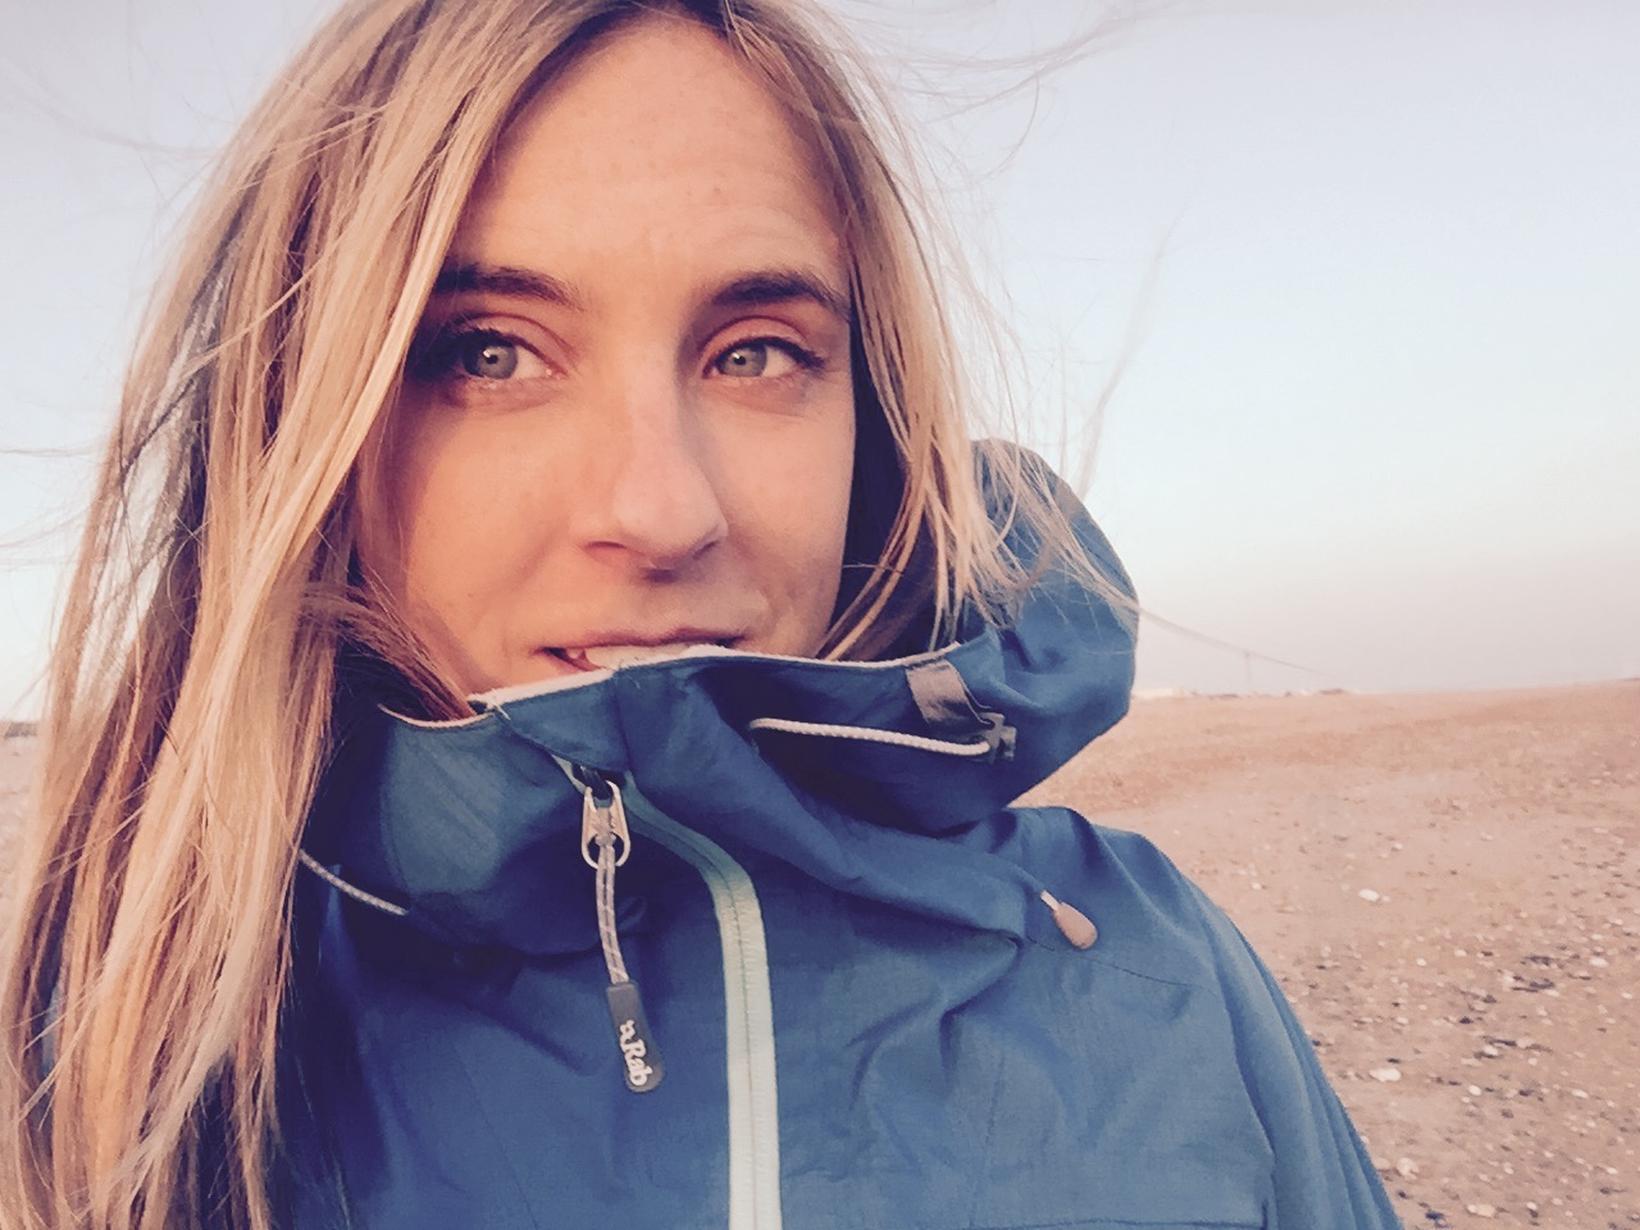 Anna katharina from Barcelona, Spain